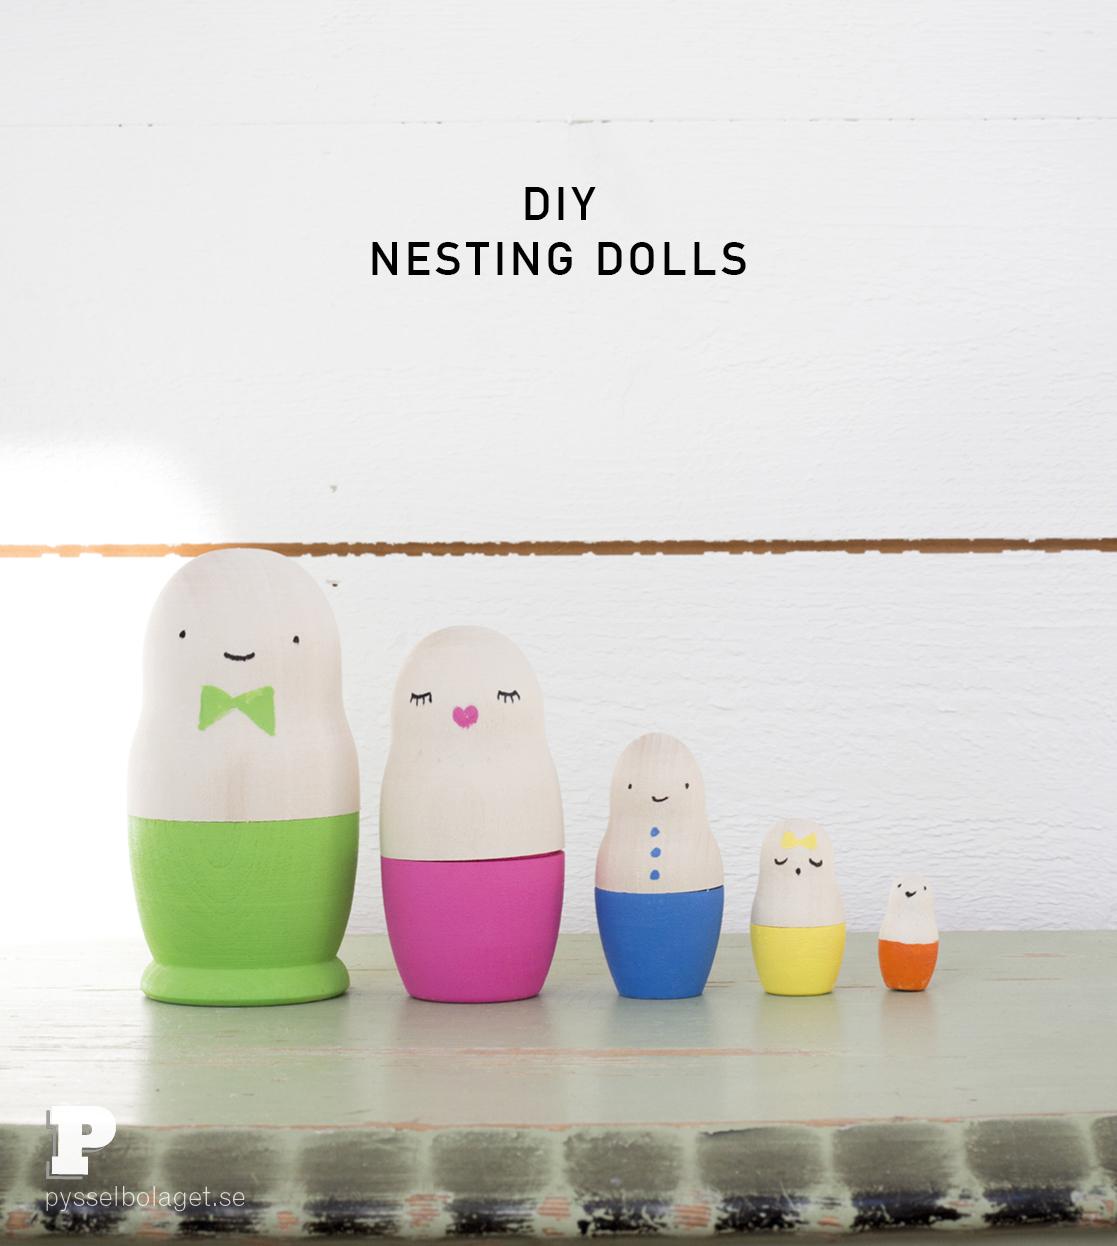 DIY Nesting dolls by Pysselbolaget